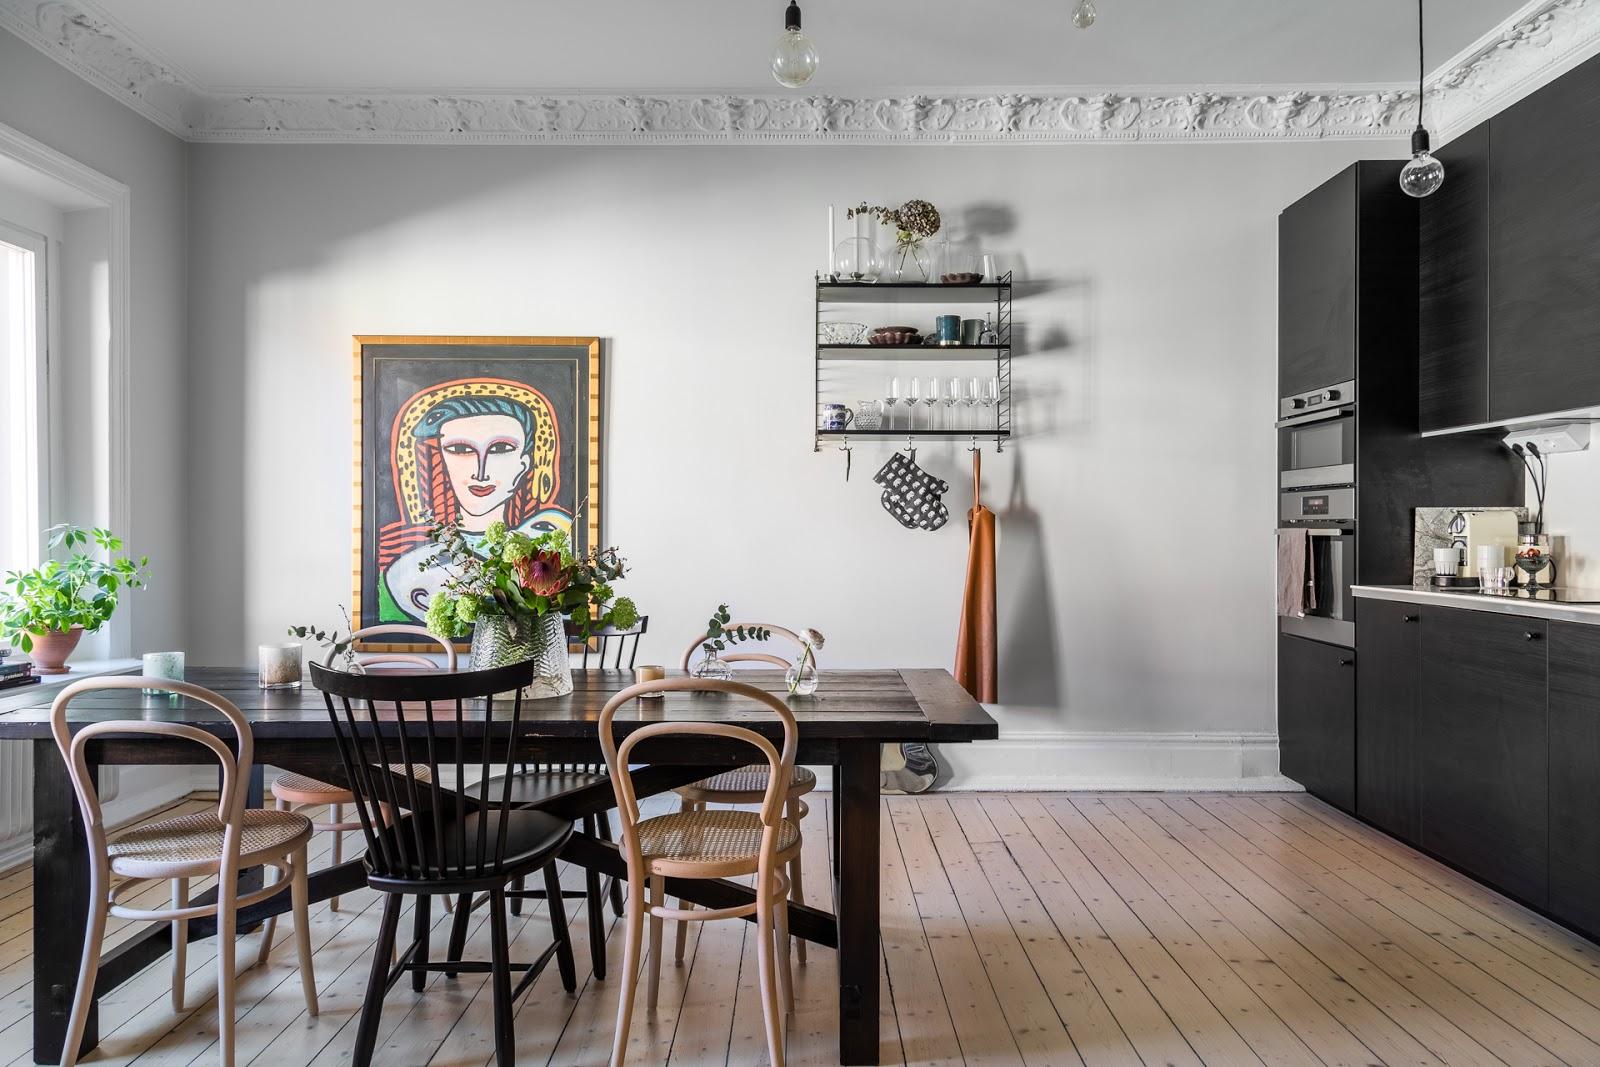 Cucina Scura In Stile Nordico Arc Art Blog By Daniele Drigo